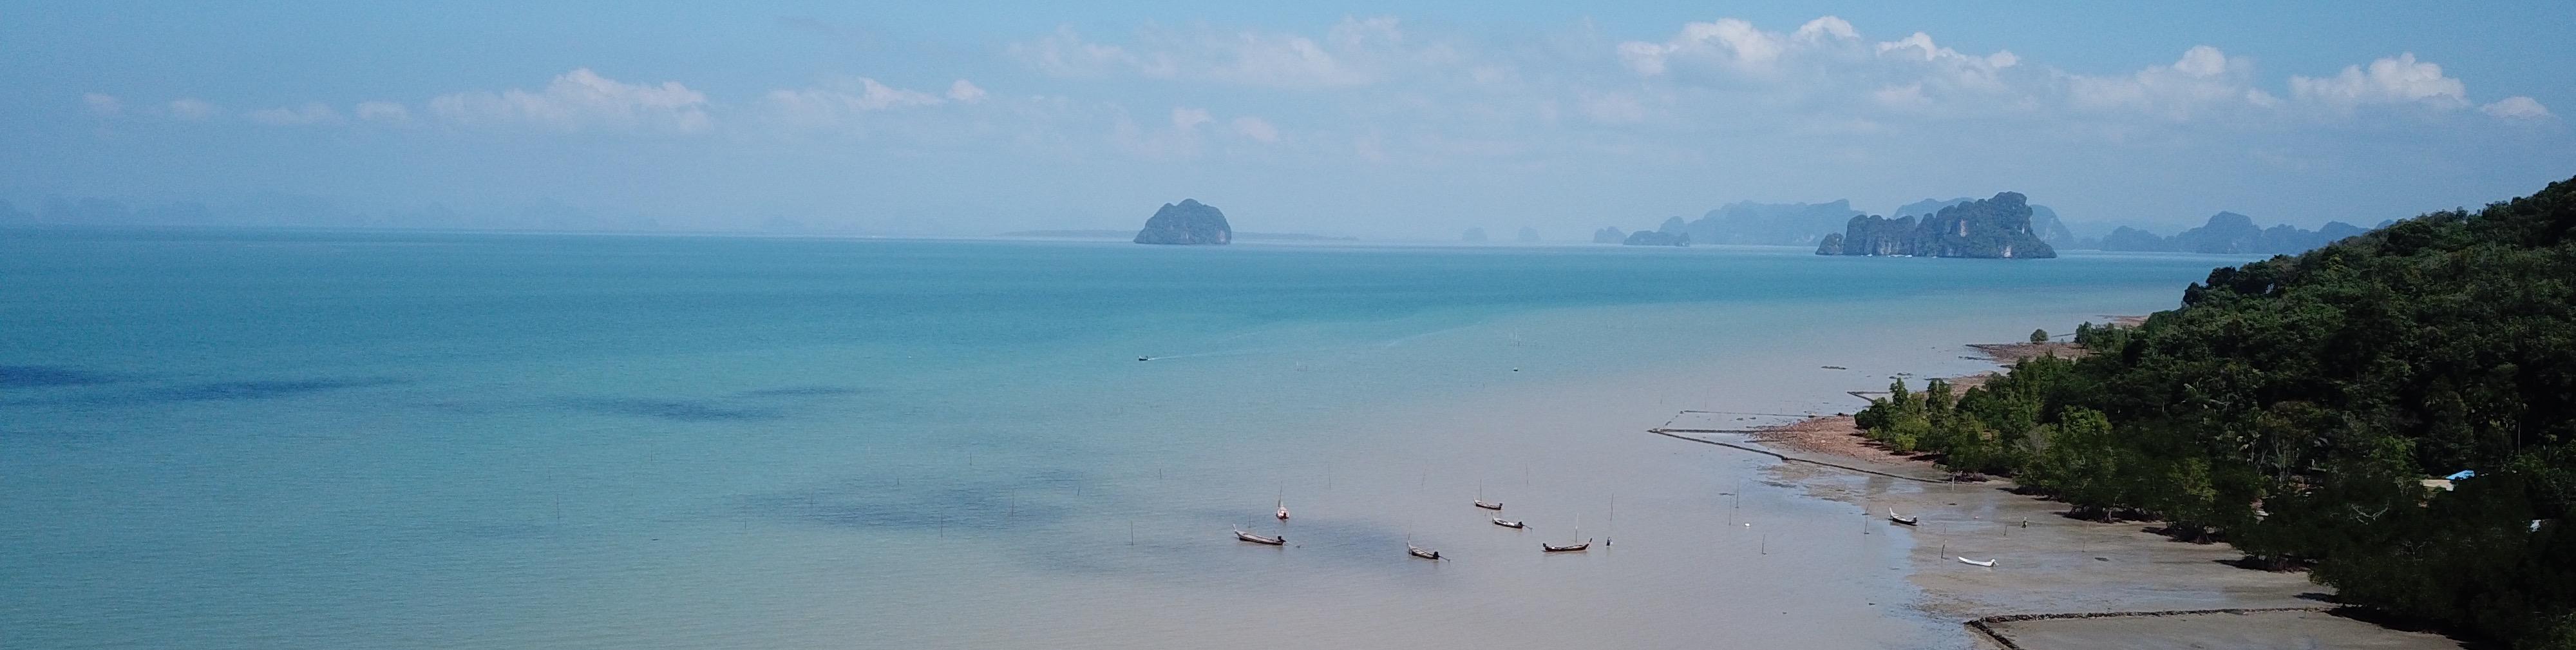 Krabi (Hong island) tour